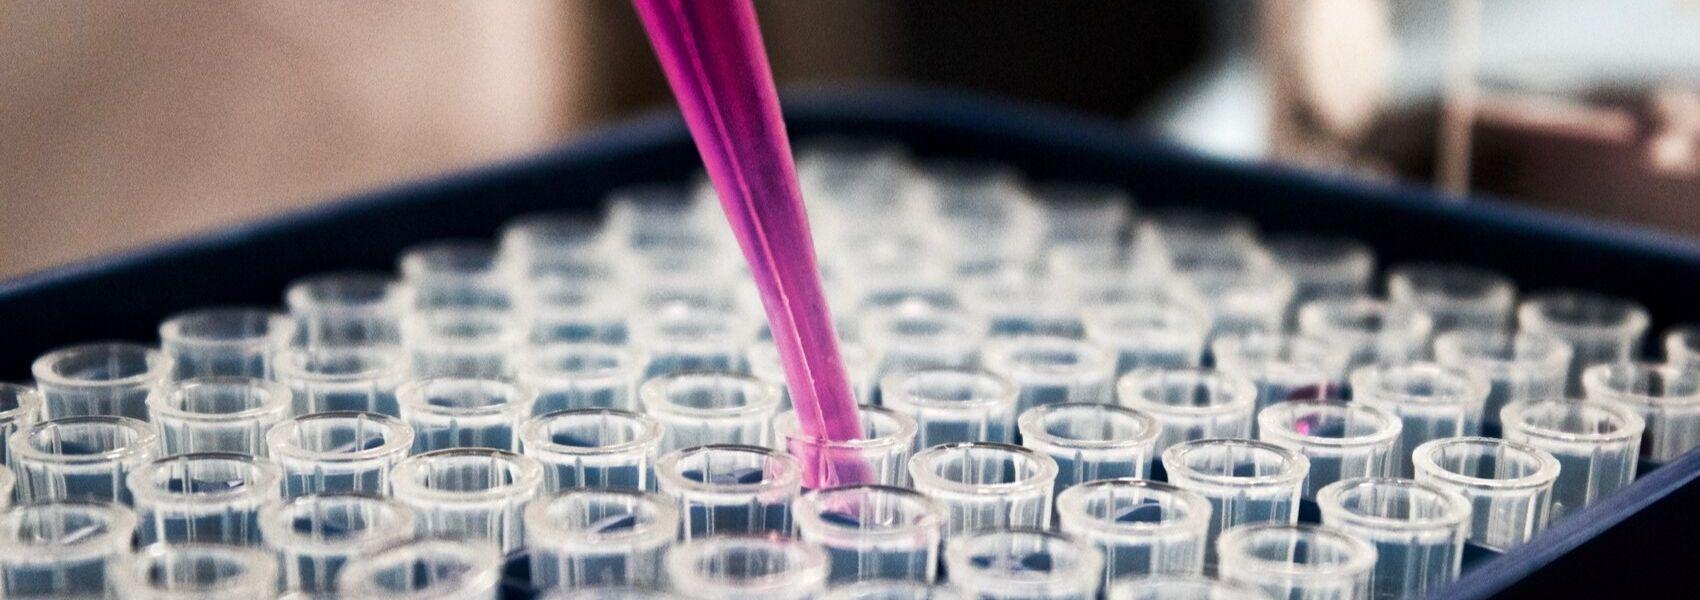 exame de sangue para detetar cancro